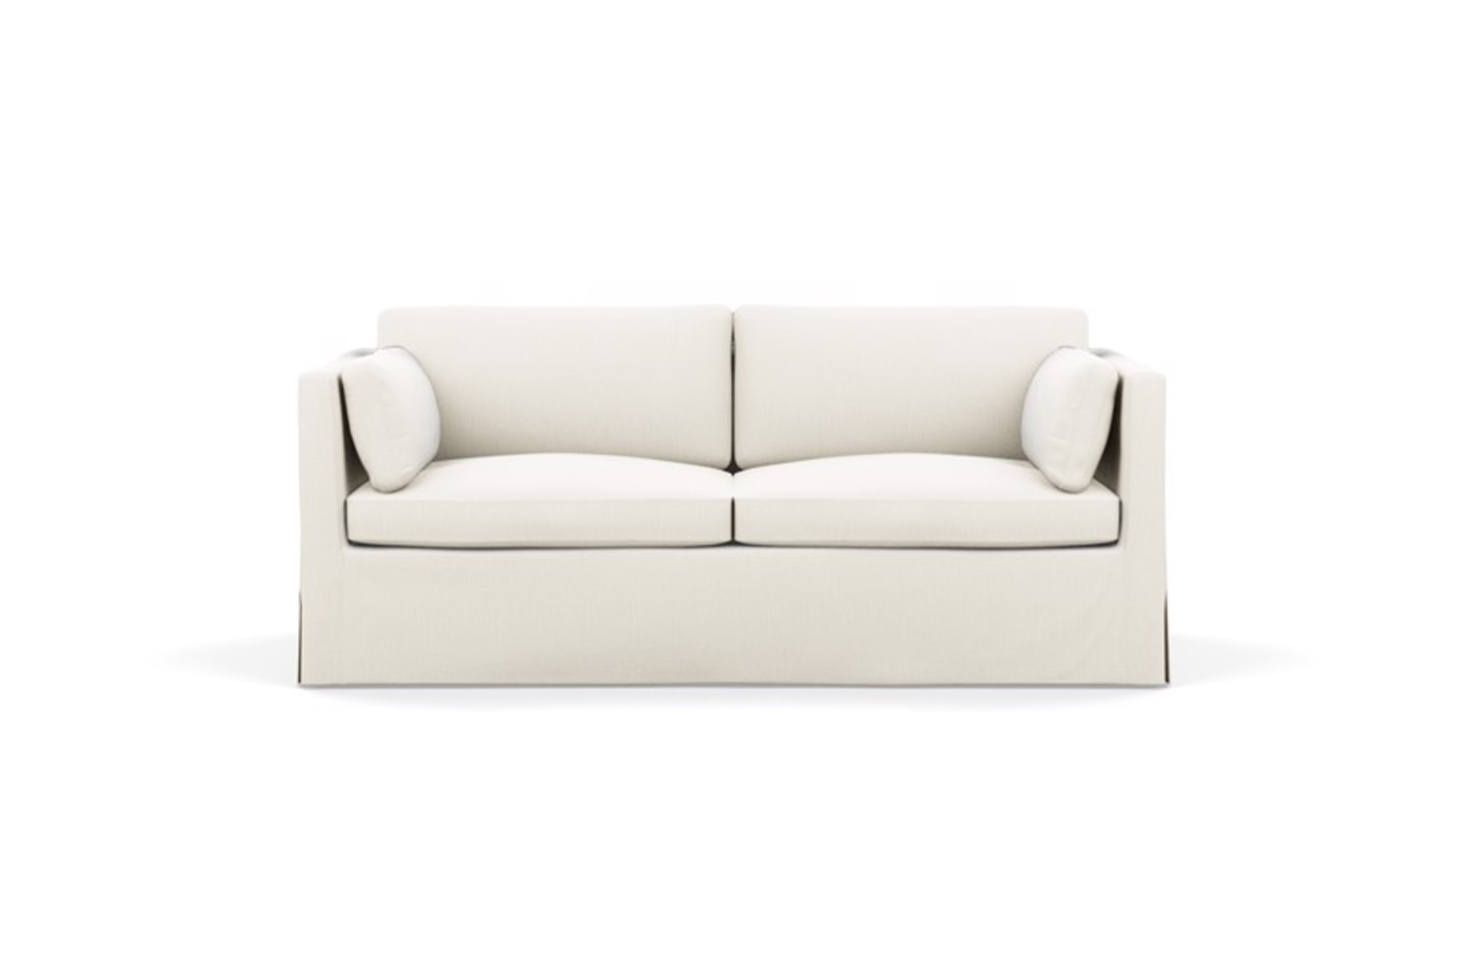 10 Easy Pieces First Sofas Under 3 000 Remodelista Remodelista Classic Sofa Sofas